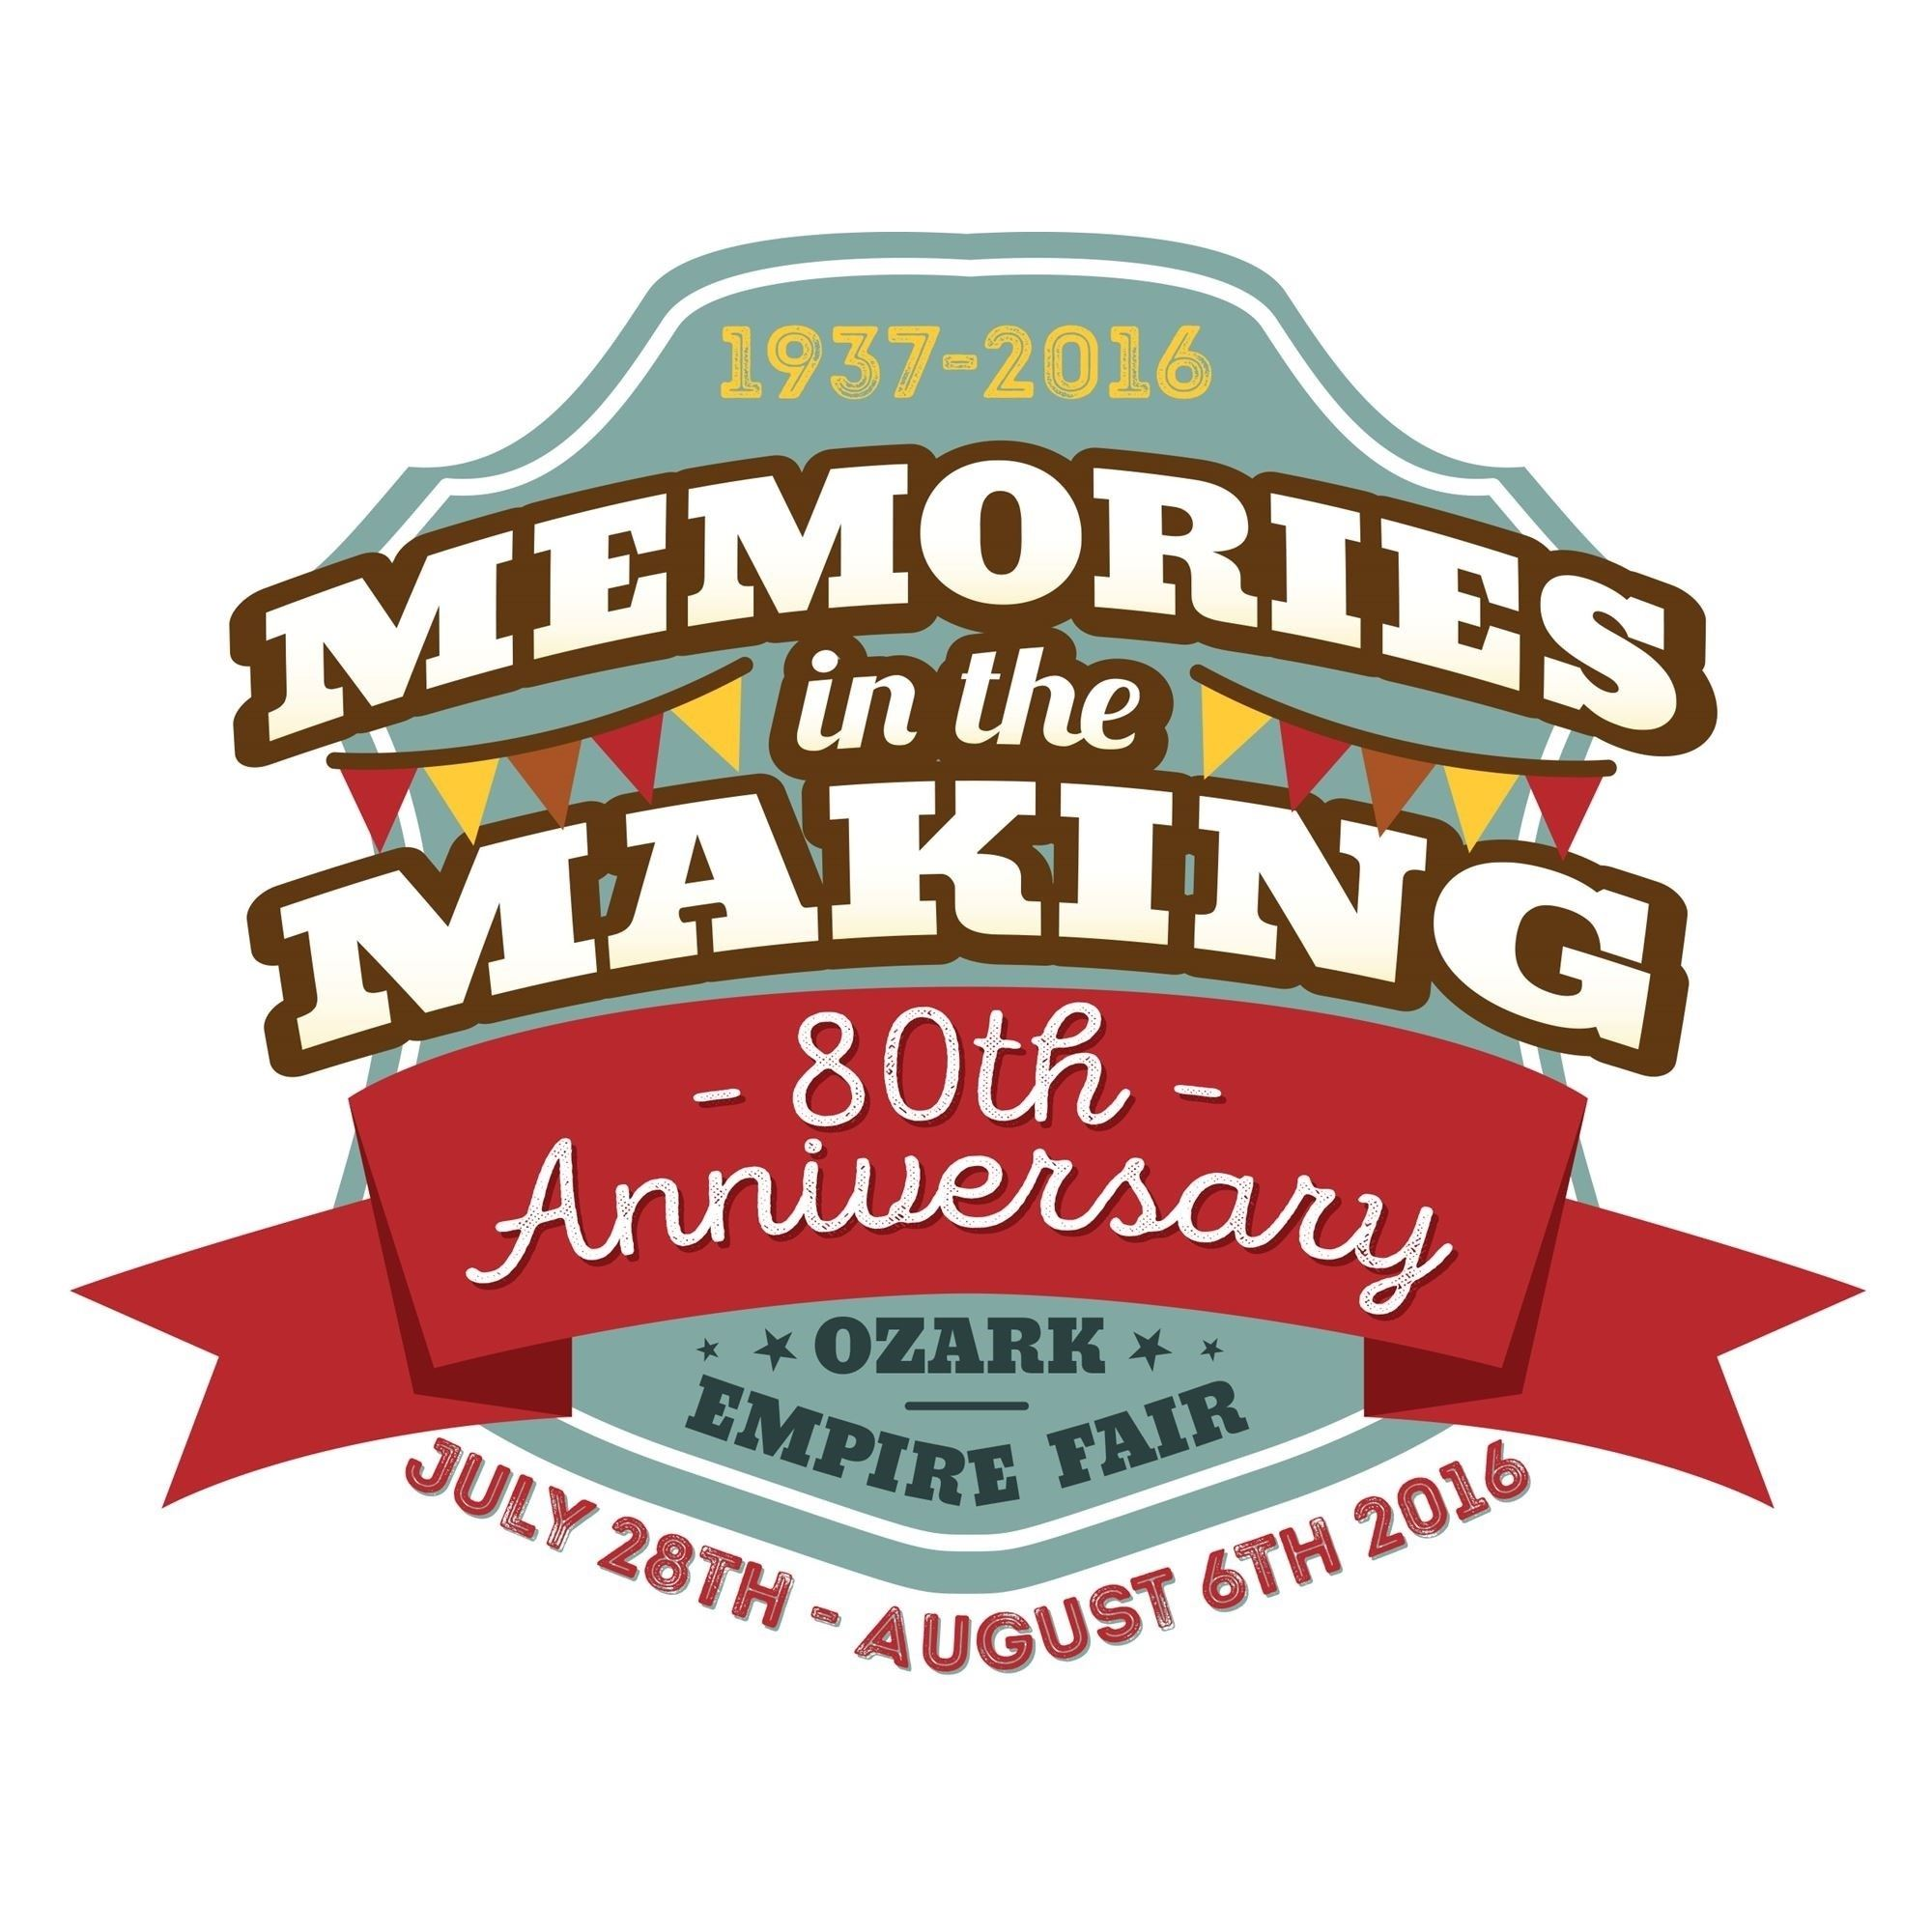 2016 Ozark Empire Fair Memories in the Making Logo